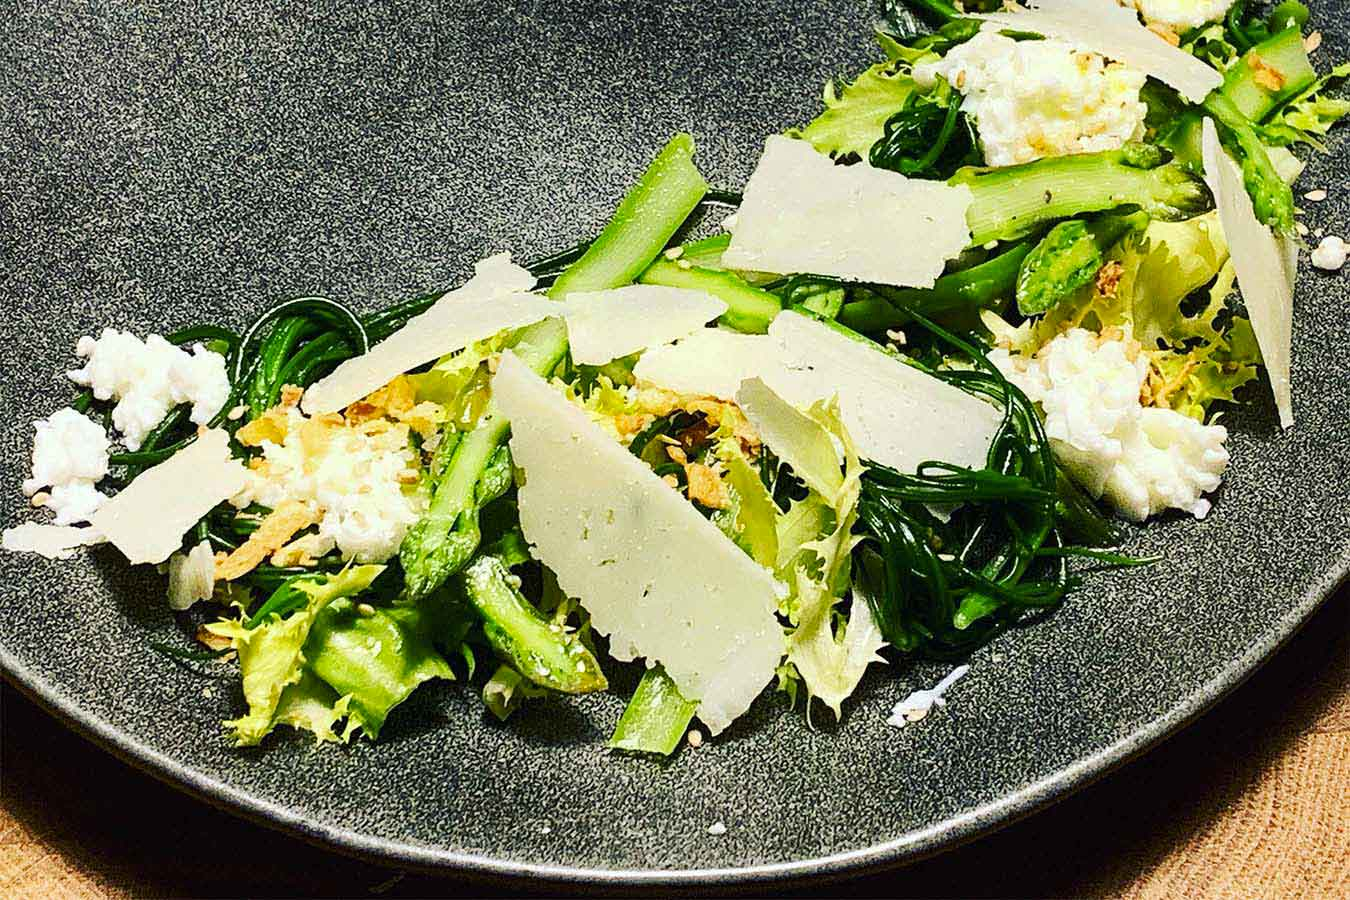 Insalata agli asparagi